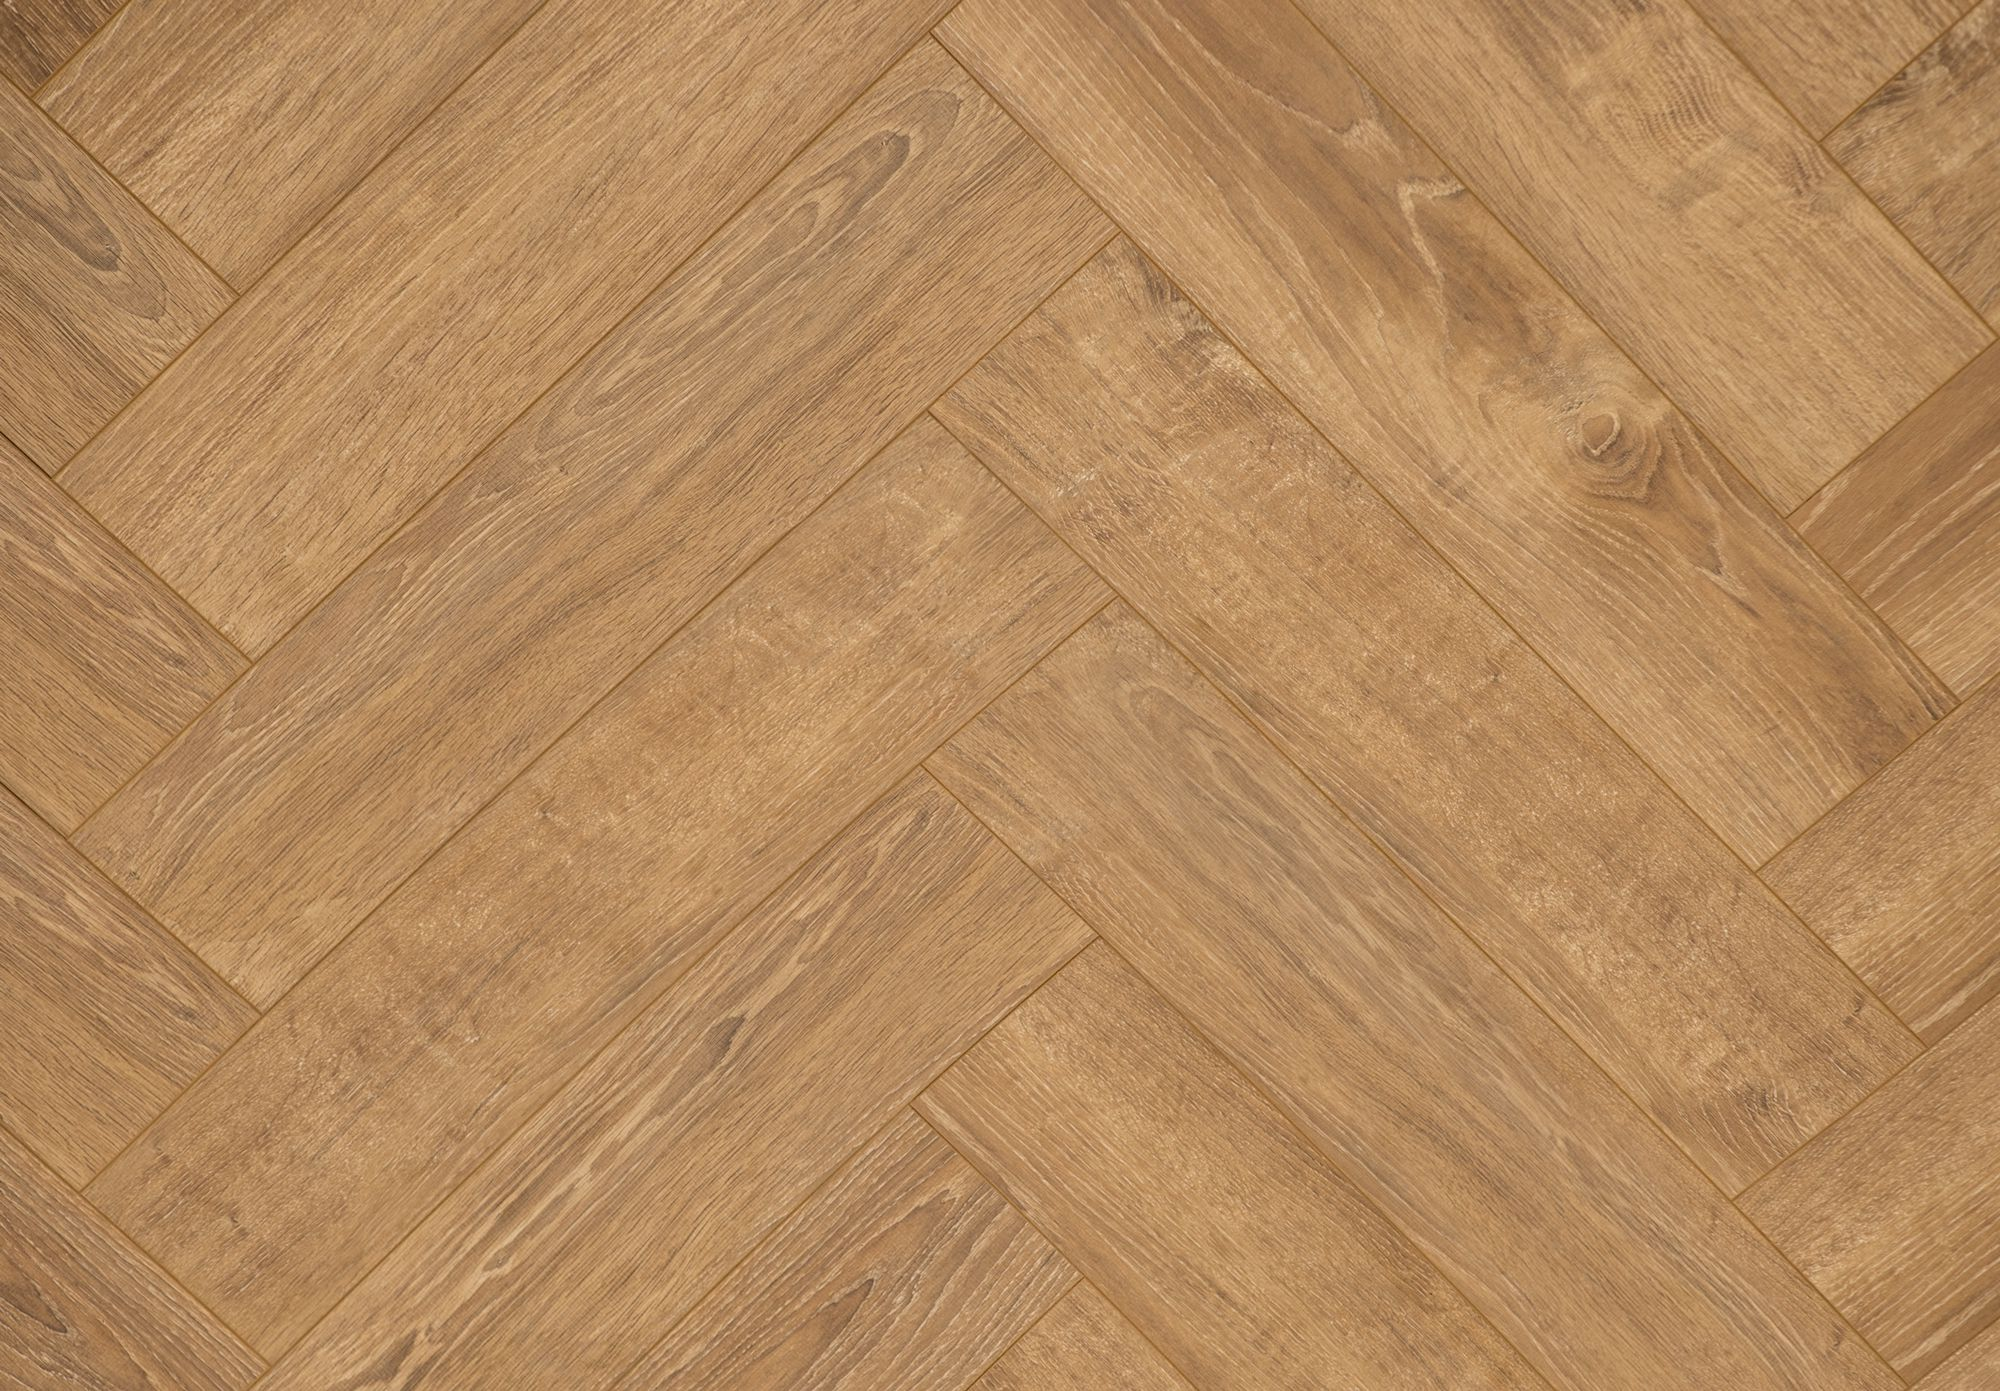 Laminaat Frans Eiken : Fesca visgraat laminaat gerookt eiken vloer patroon eik ac